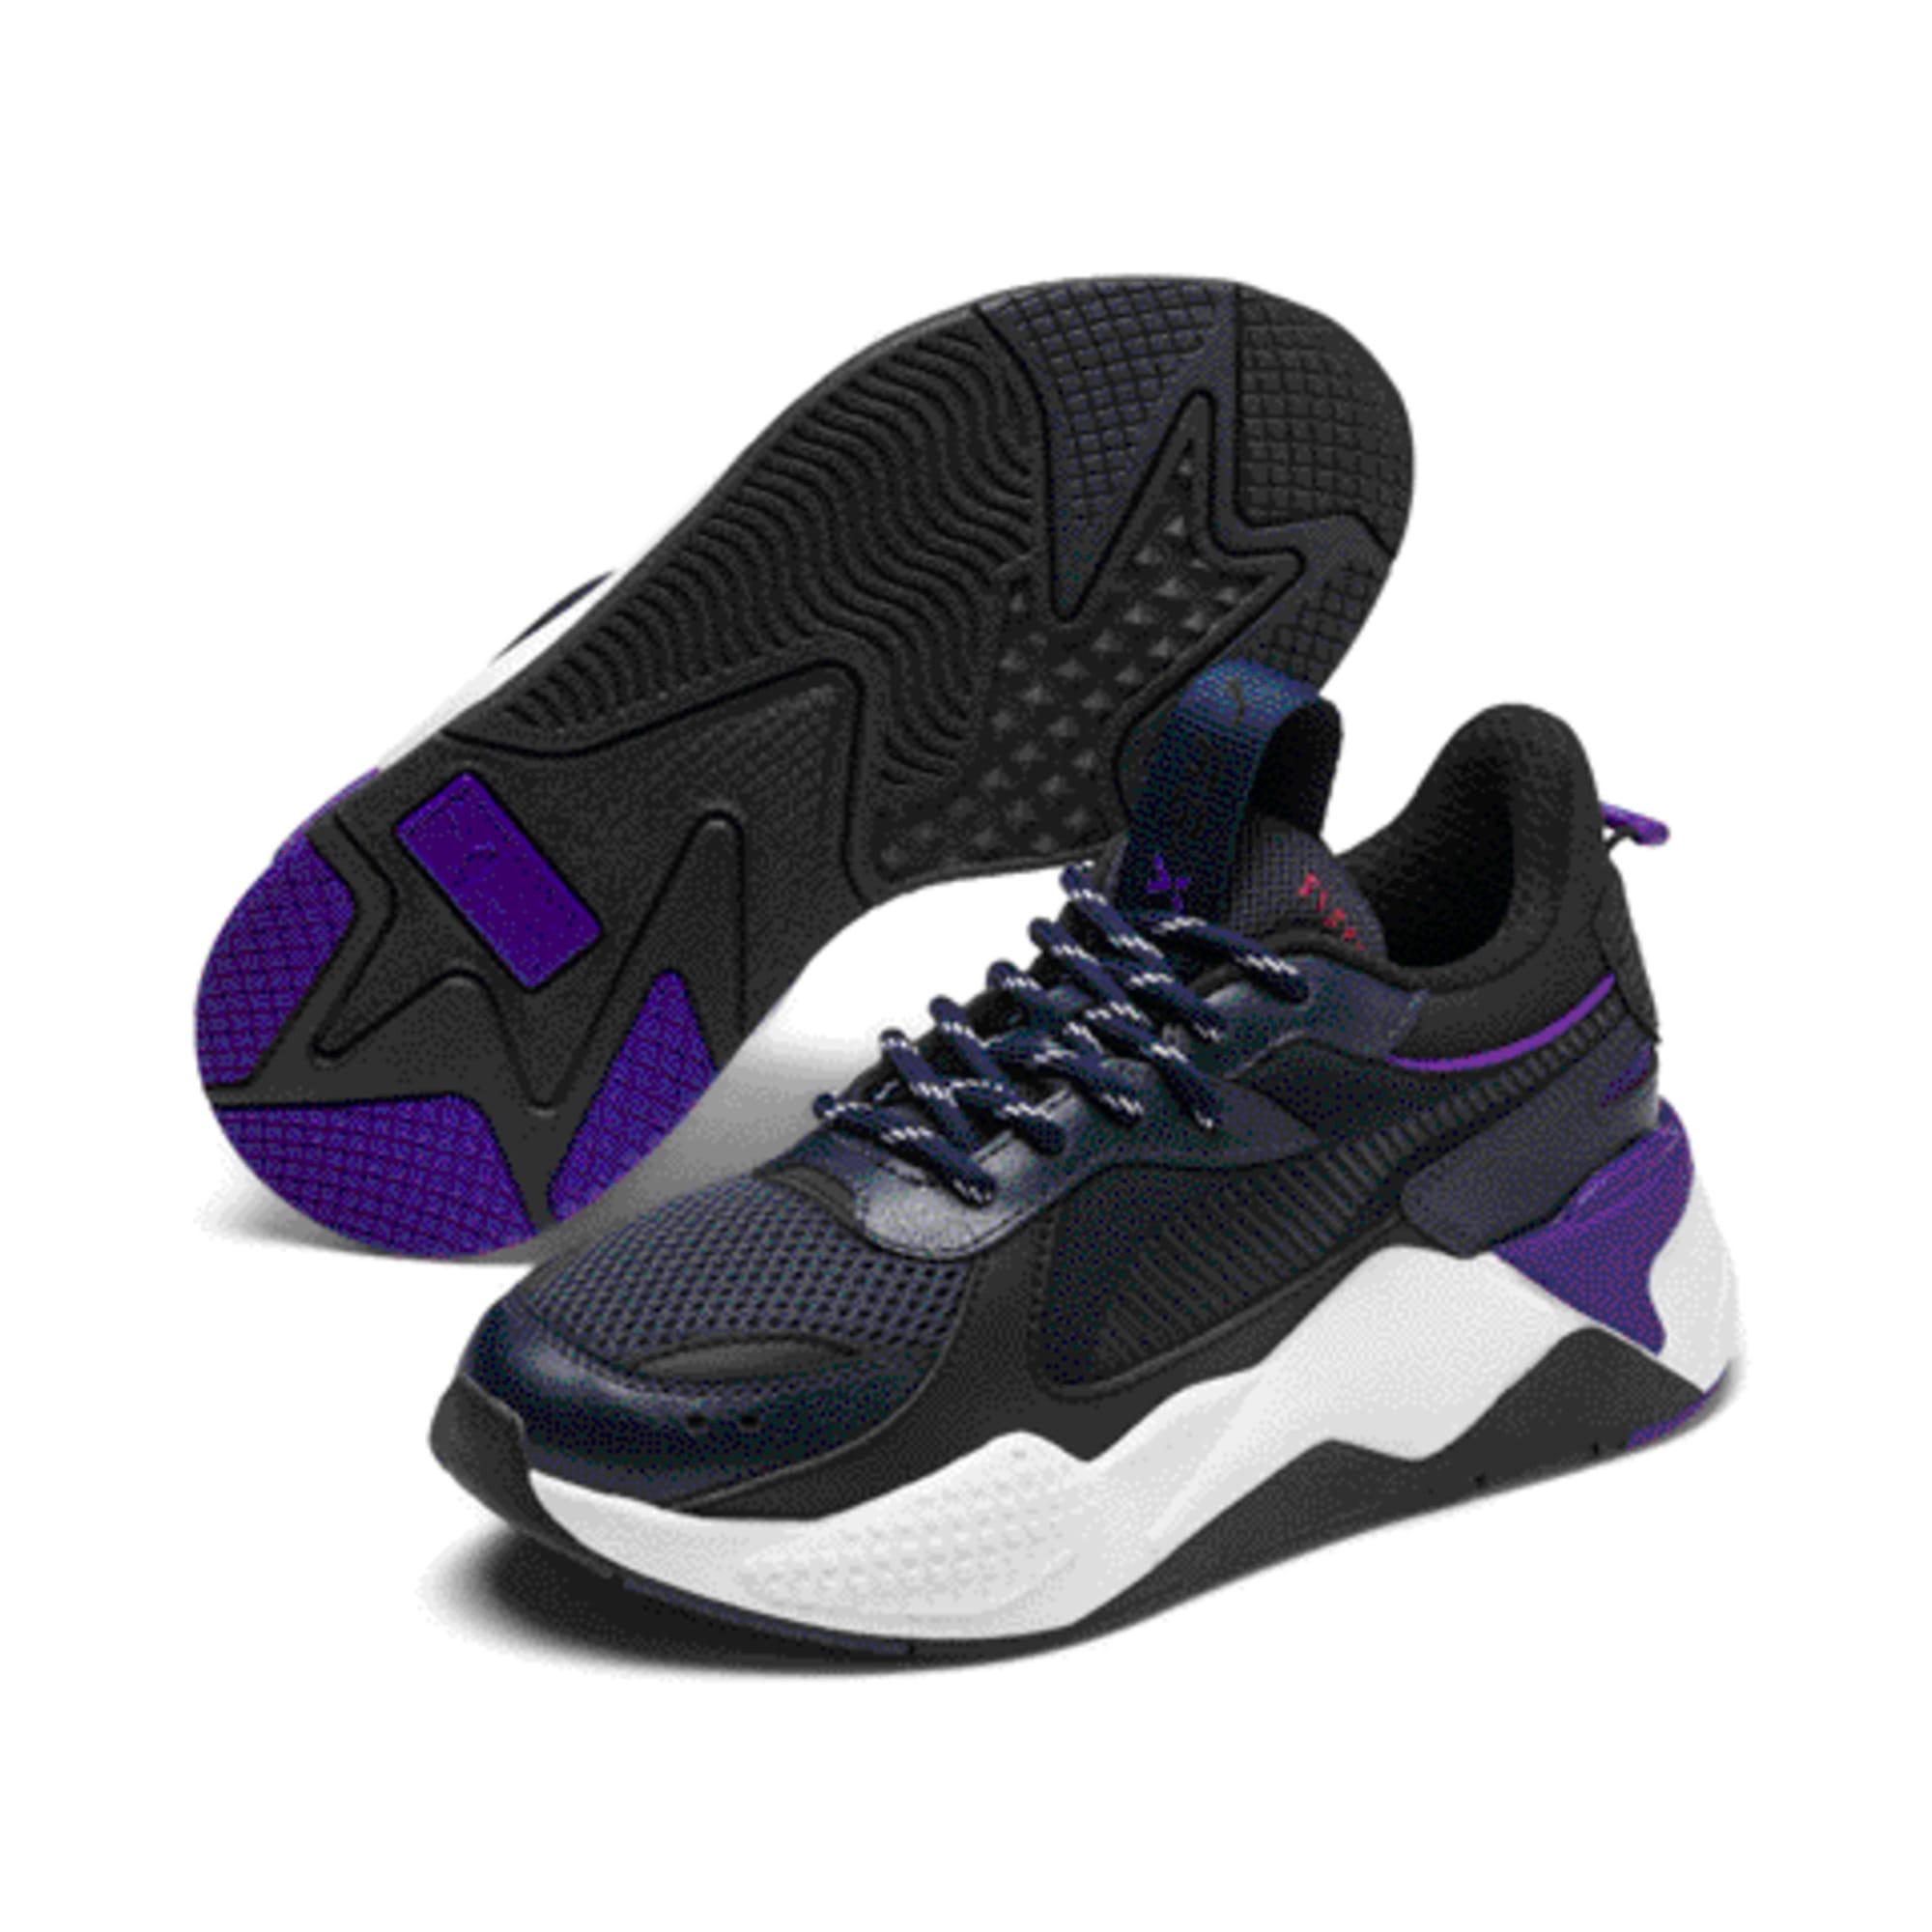 Thumbnail 1 of RS-X Tracks Sneakers JR, Puma New Navy-Puma Black, medium